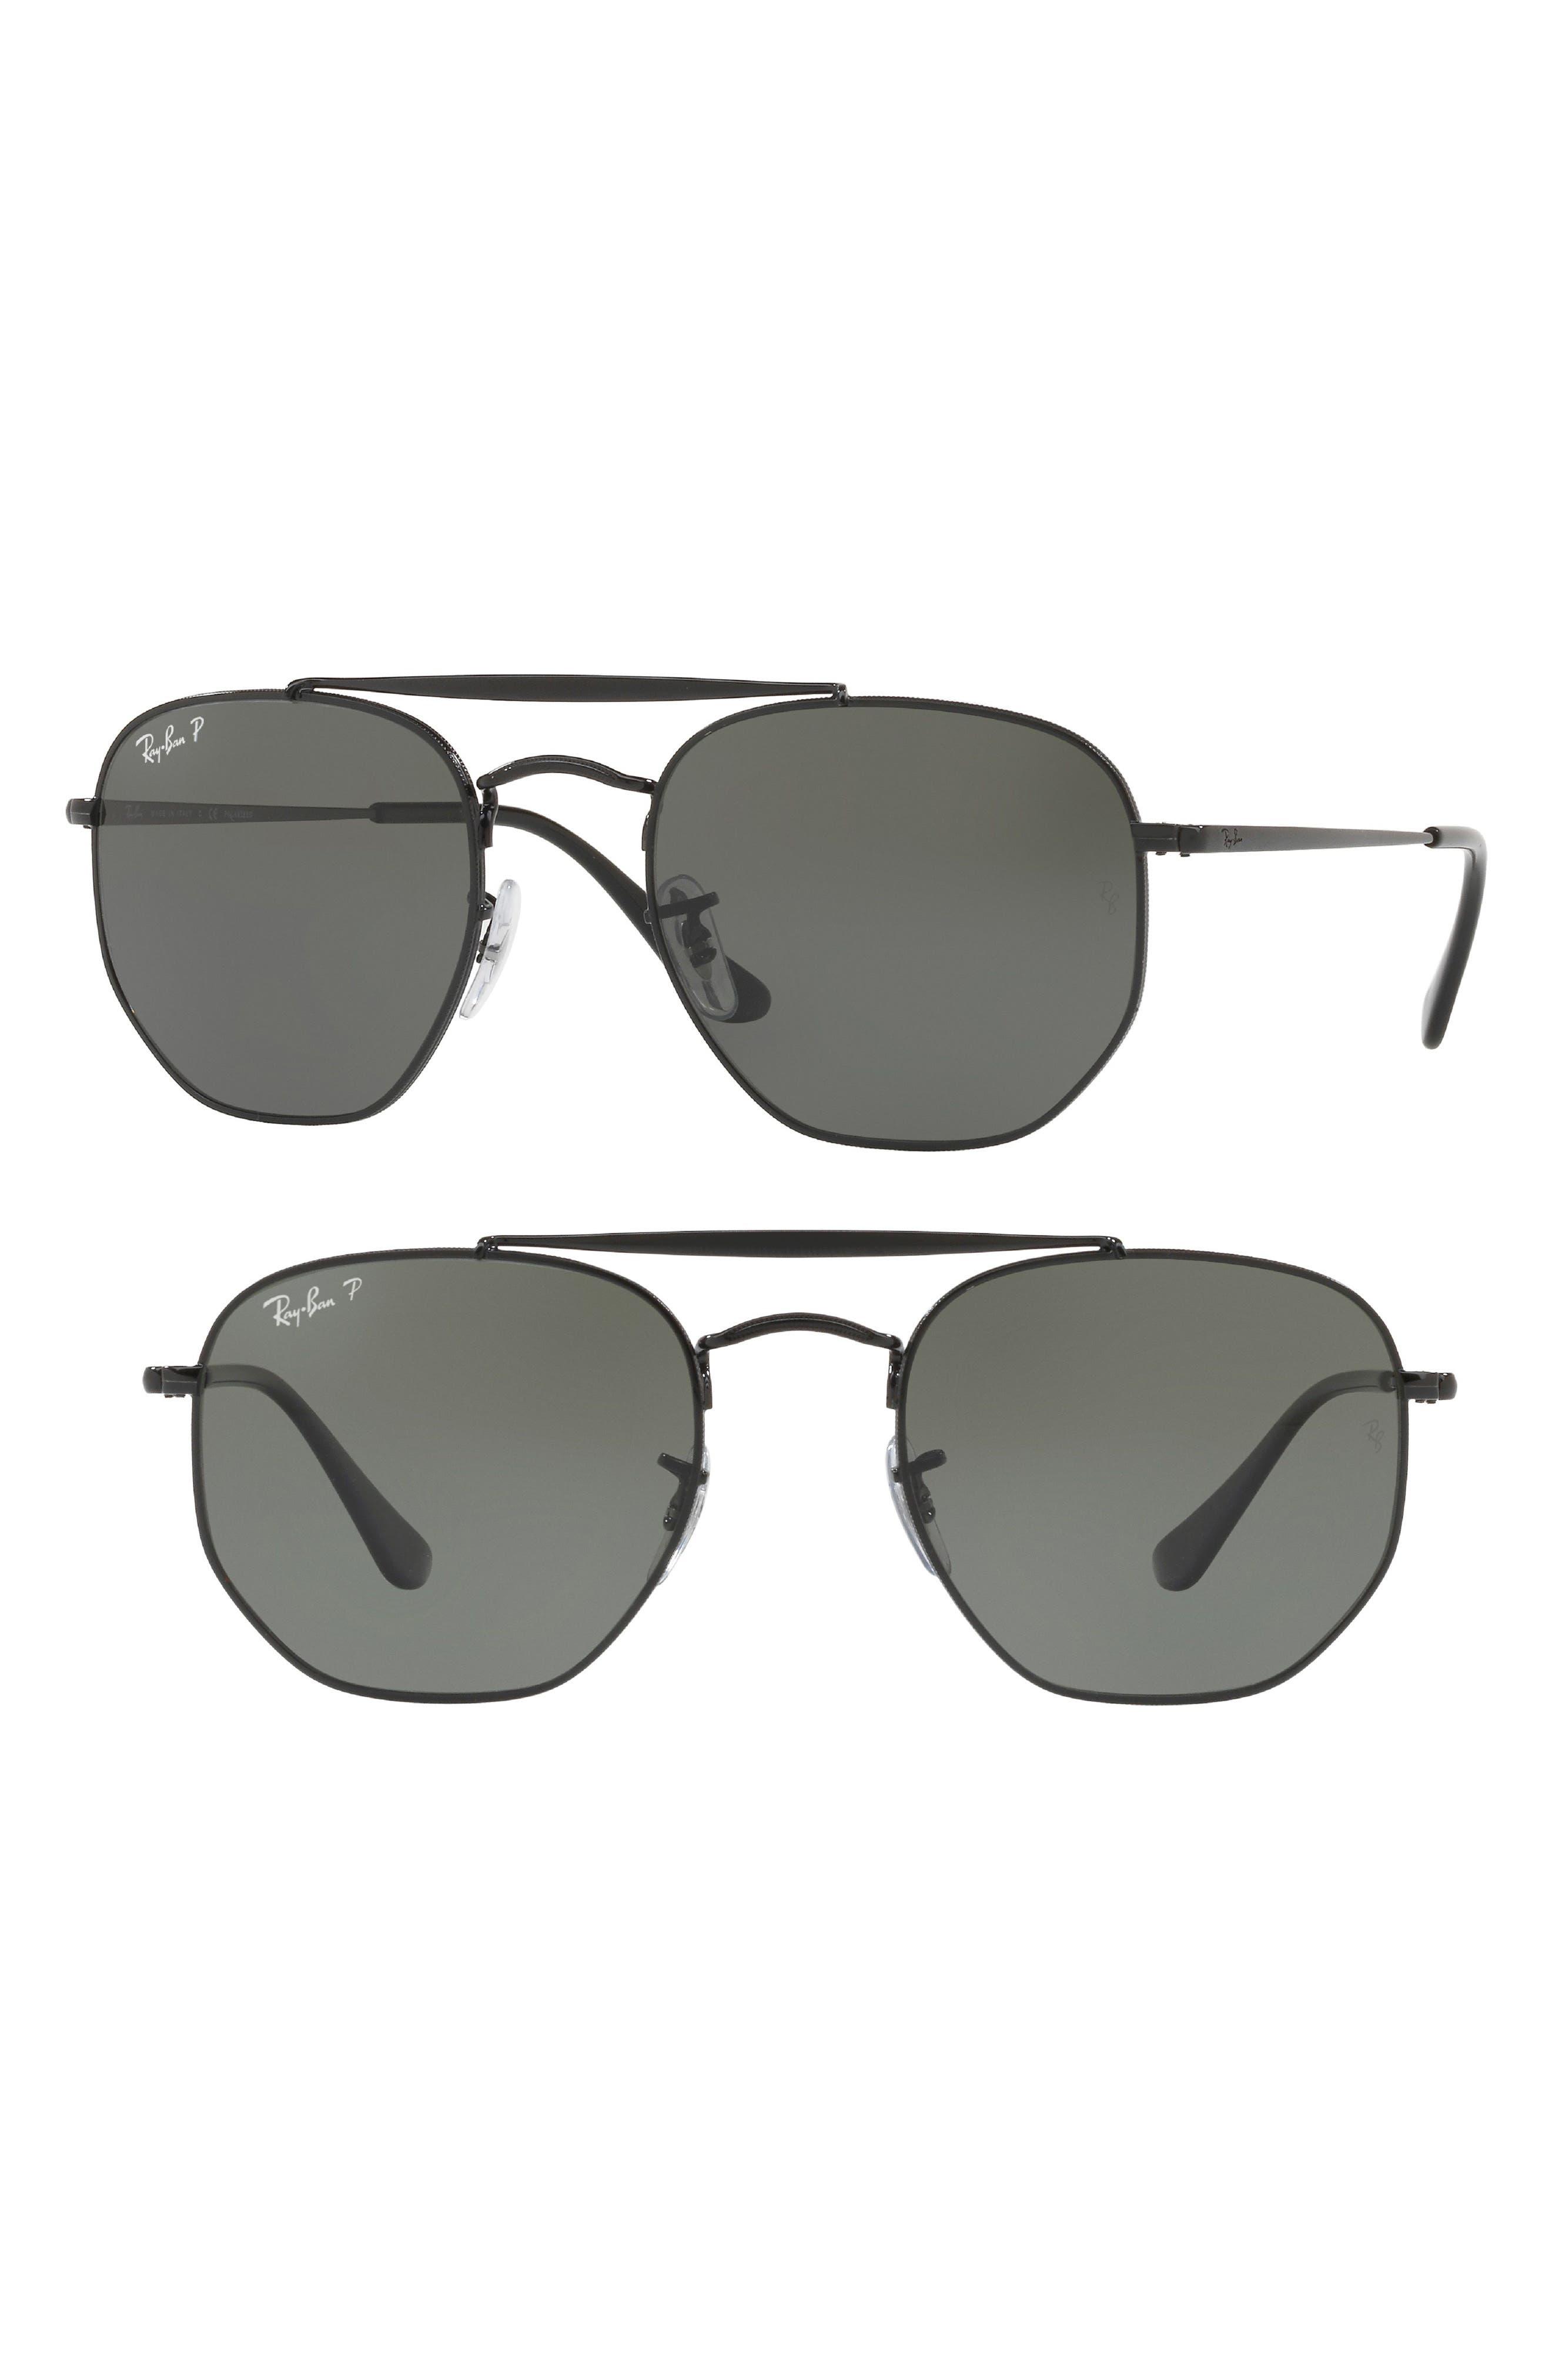 55mm Geometric Sunglasses,                             Main thumbnail 1, color,                             002